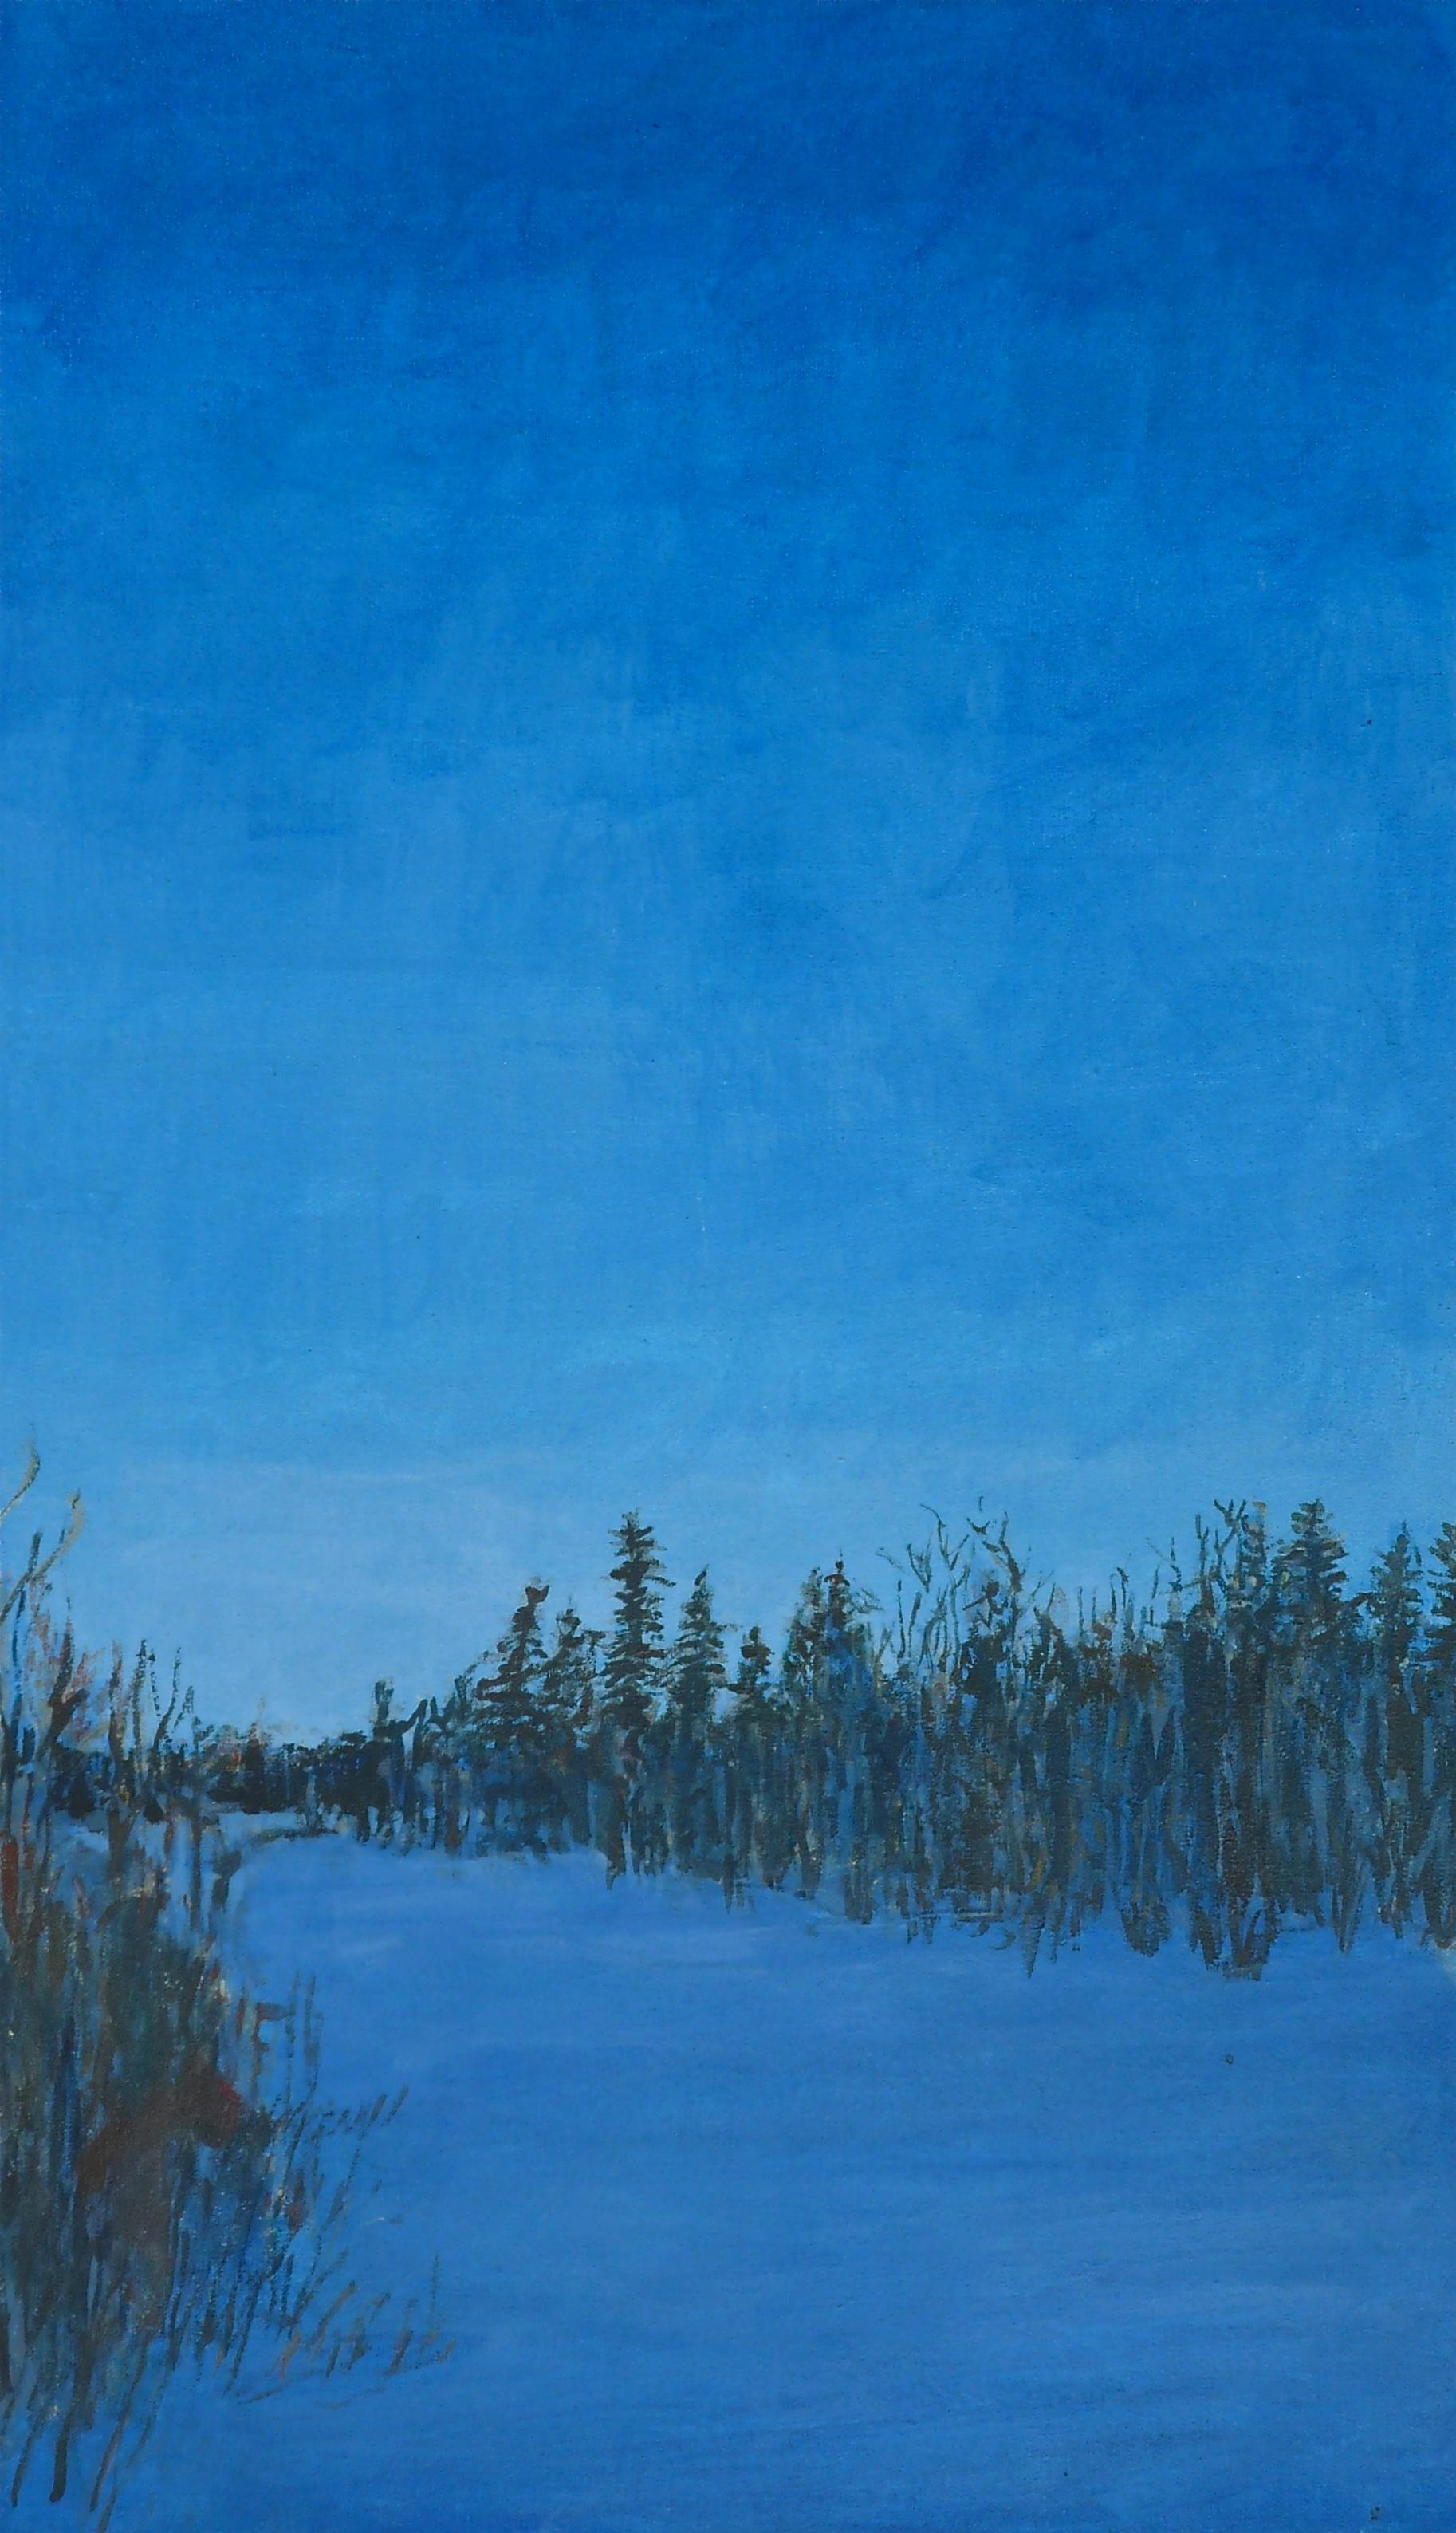 AB-007, Blue Evening in December,  2004,  22 x 13, SOLD.JPG